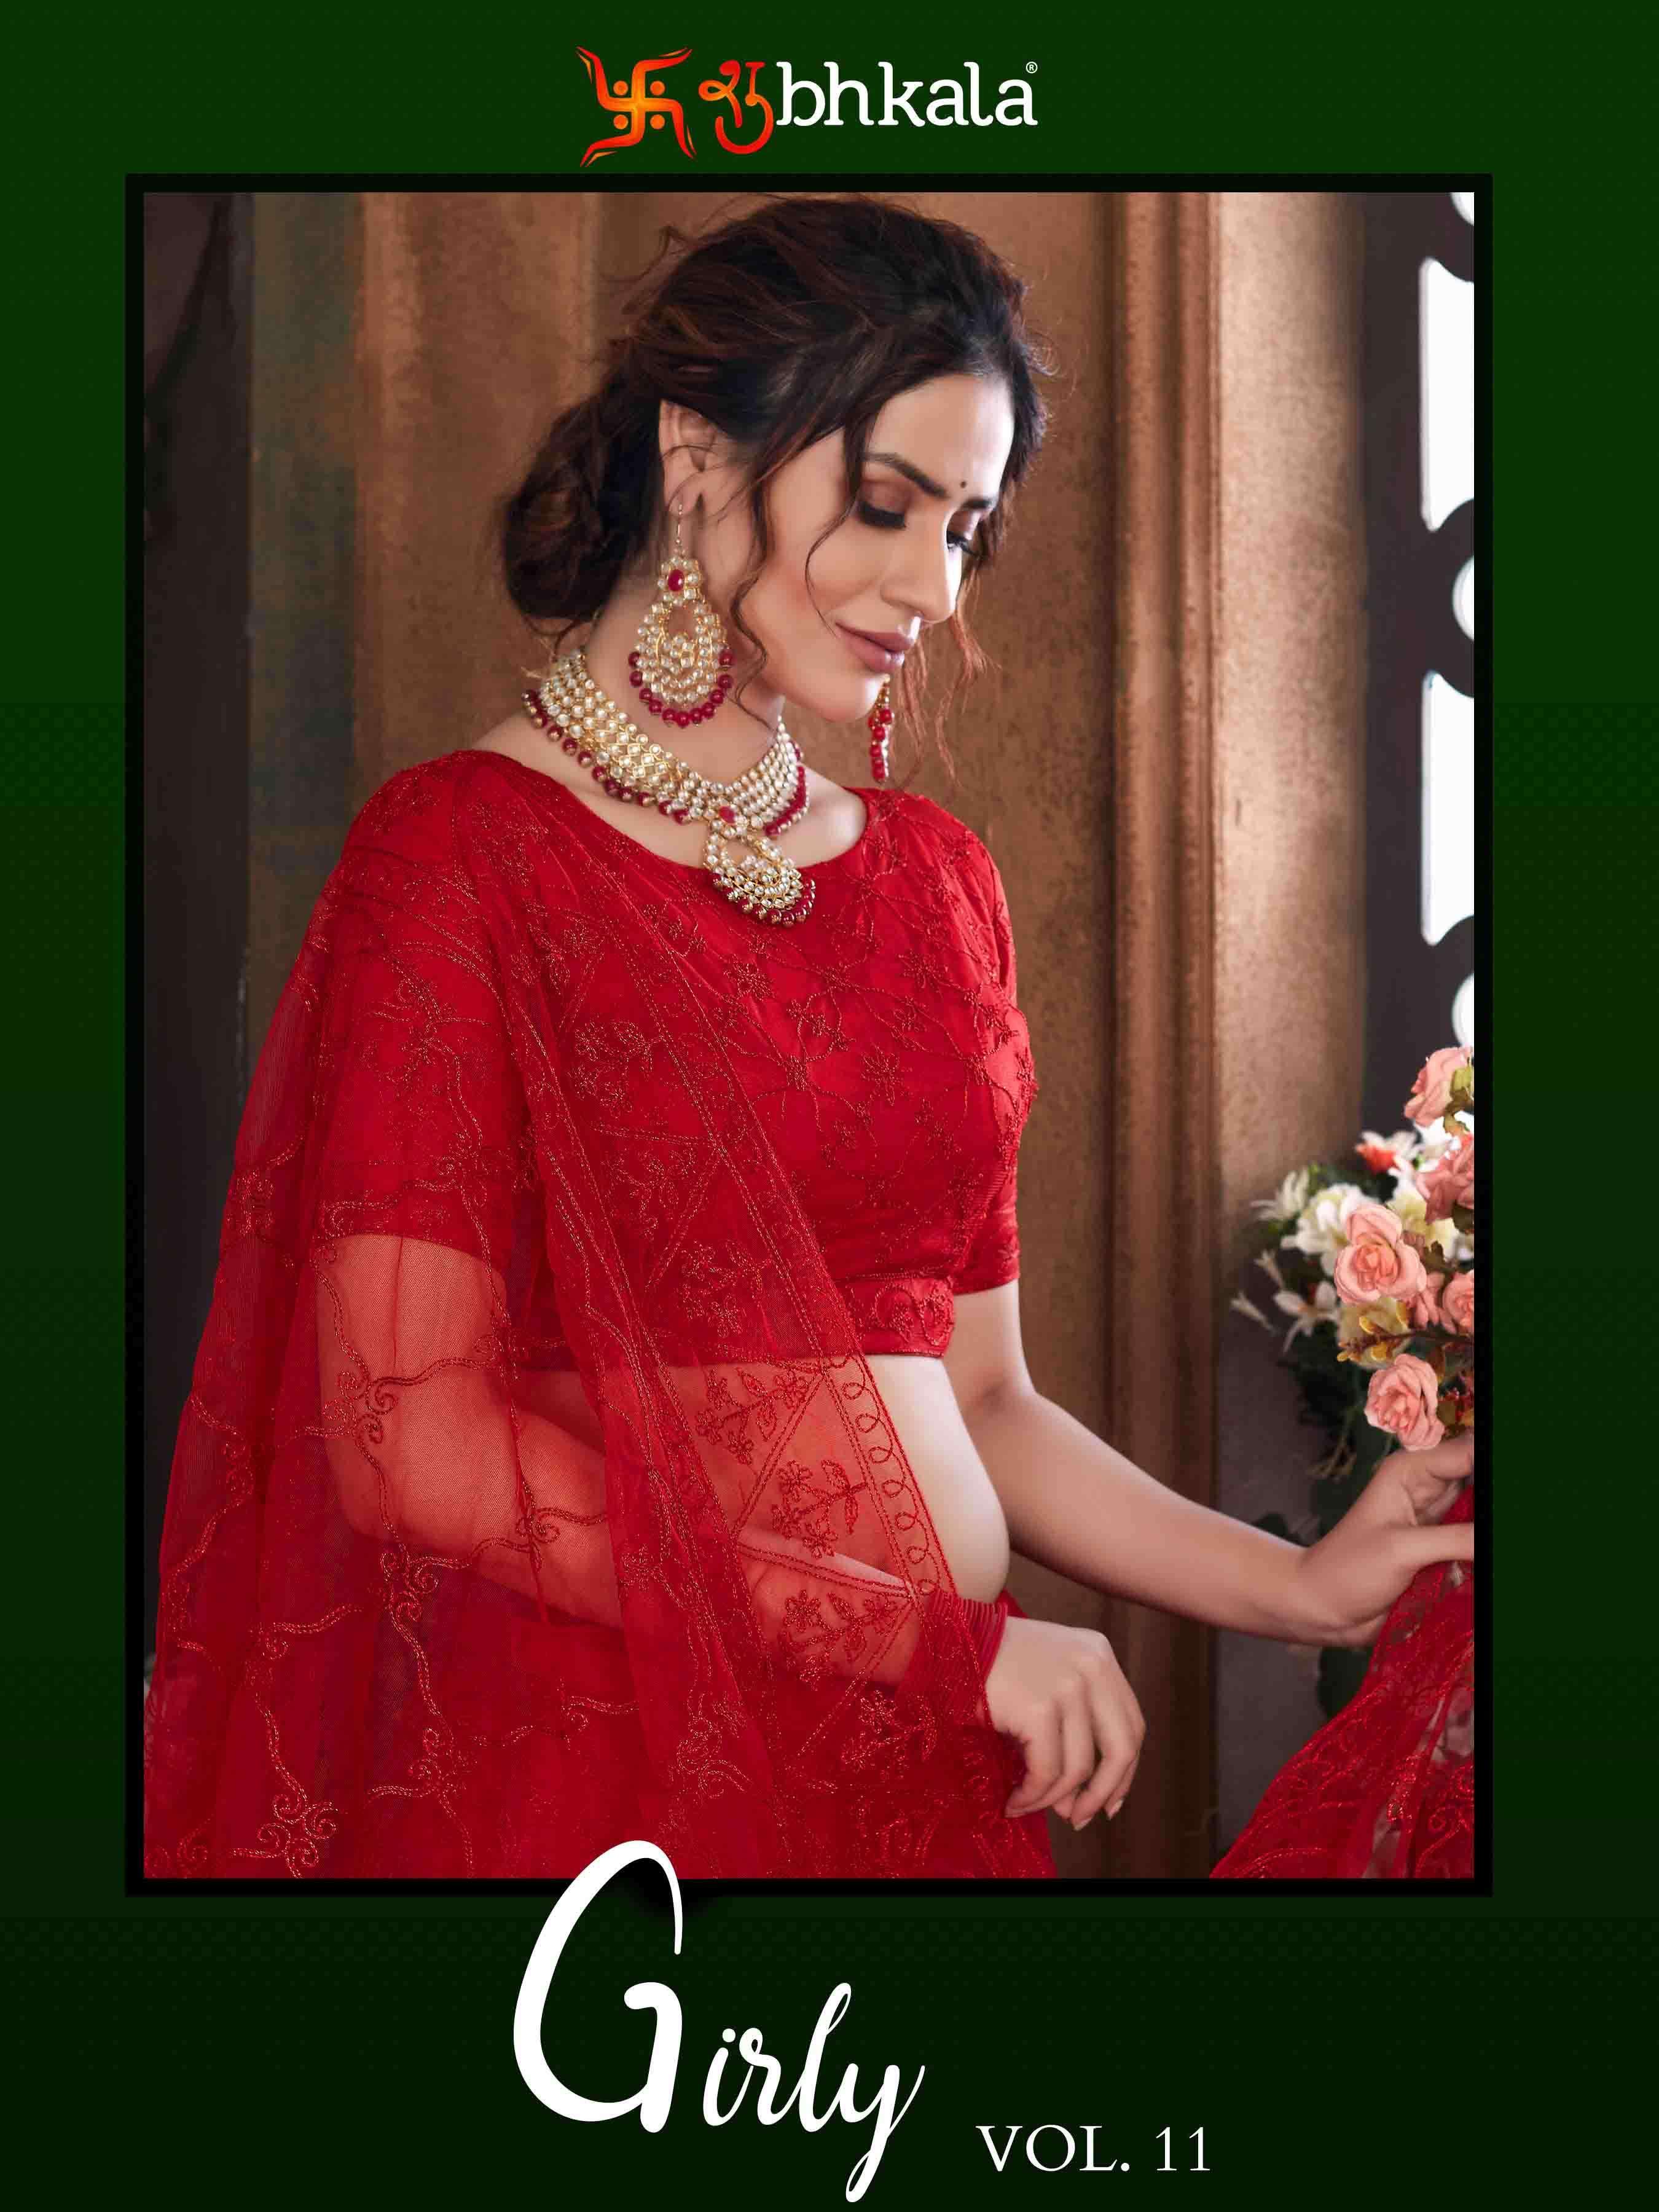 Girly Vol. 11 Exclusive Lehenga Choli Collection Of Shubhkala